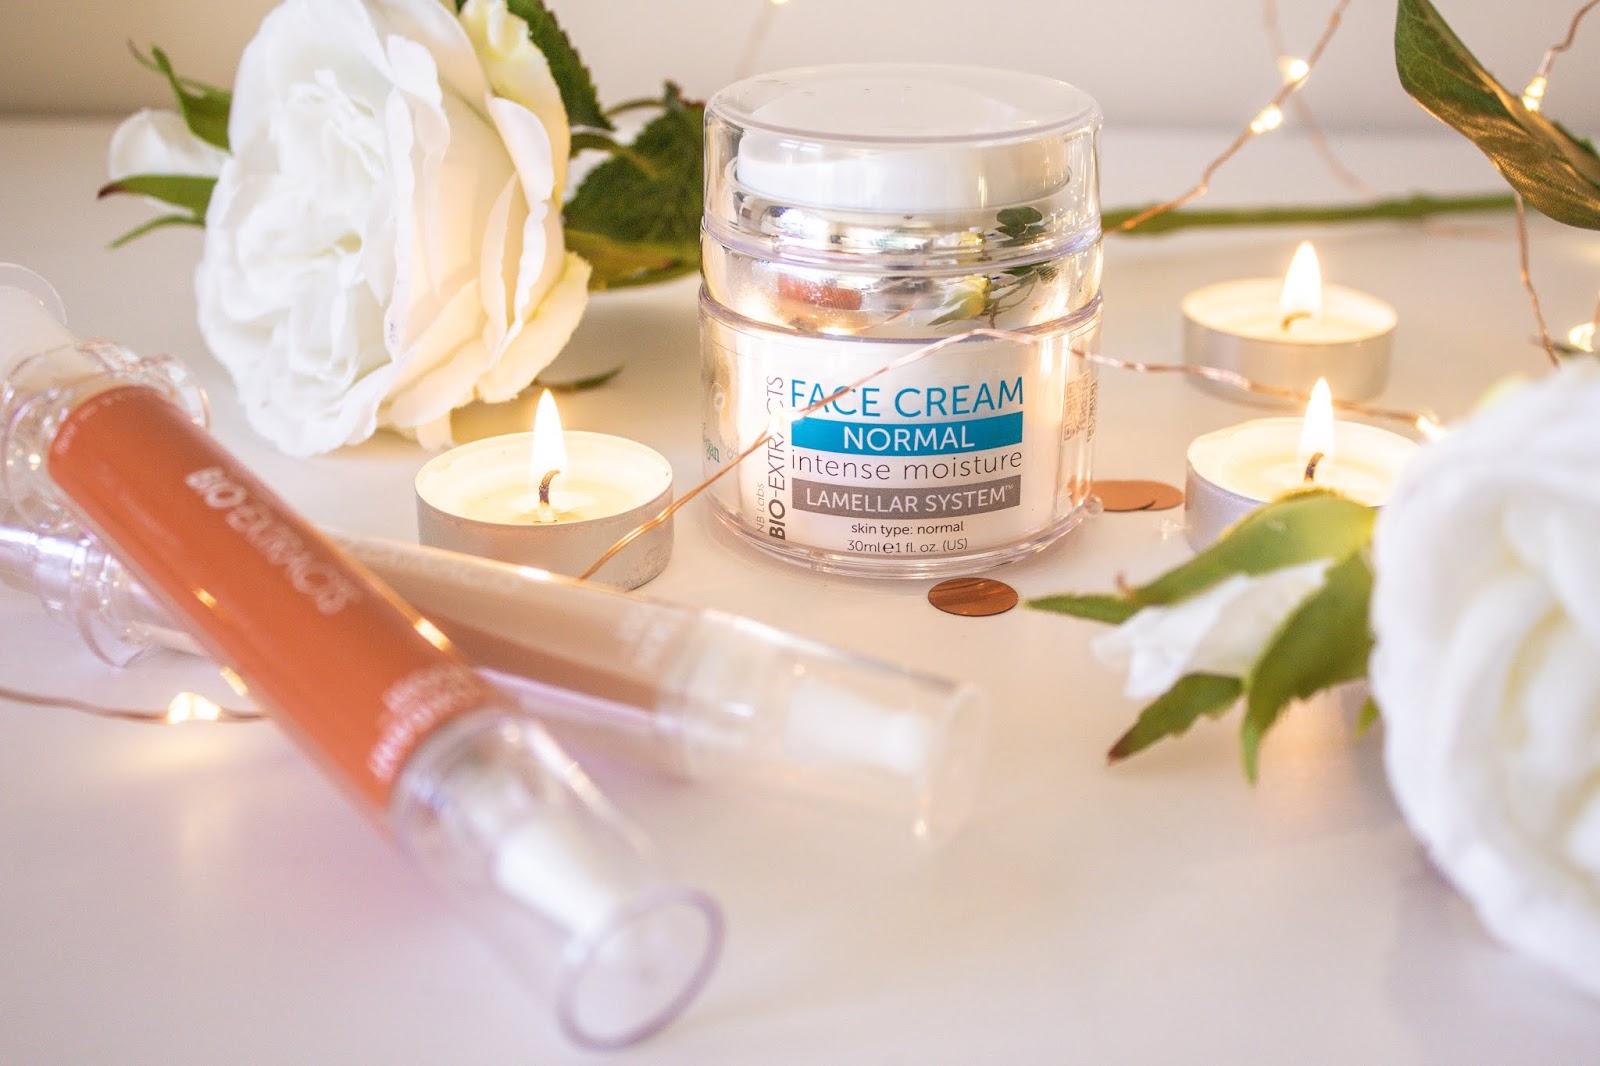 Bio-Extracts Vegan Skincare Review